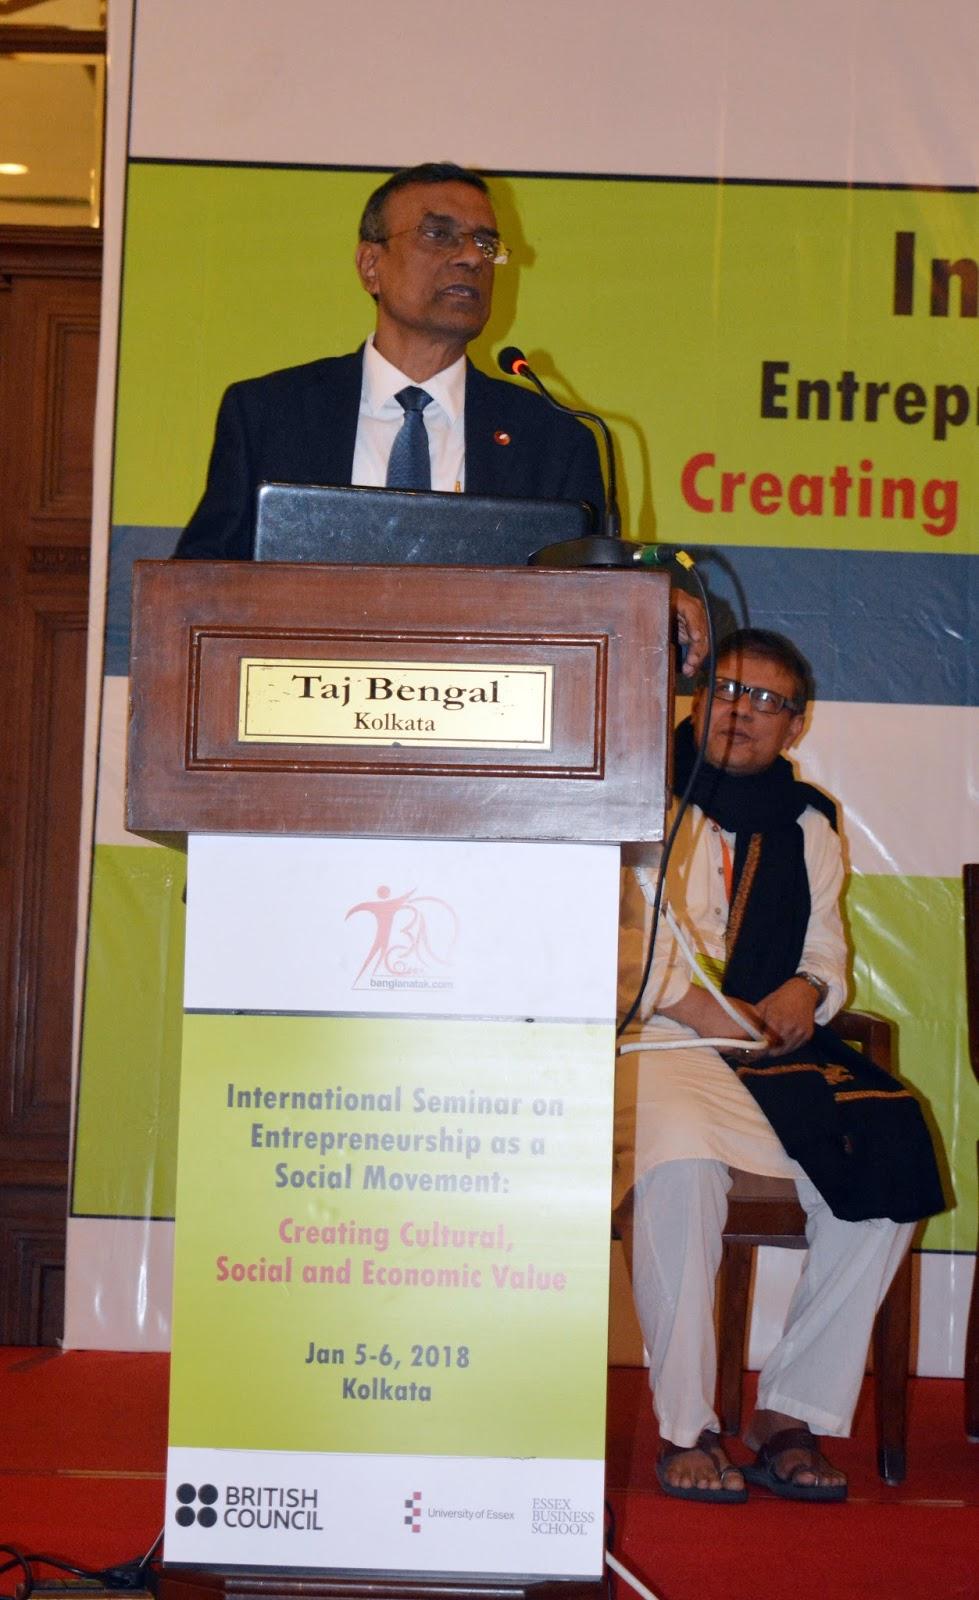 Entrepreneurship as a Social Movement: Real Life Success Stories